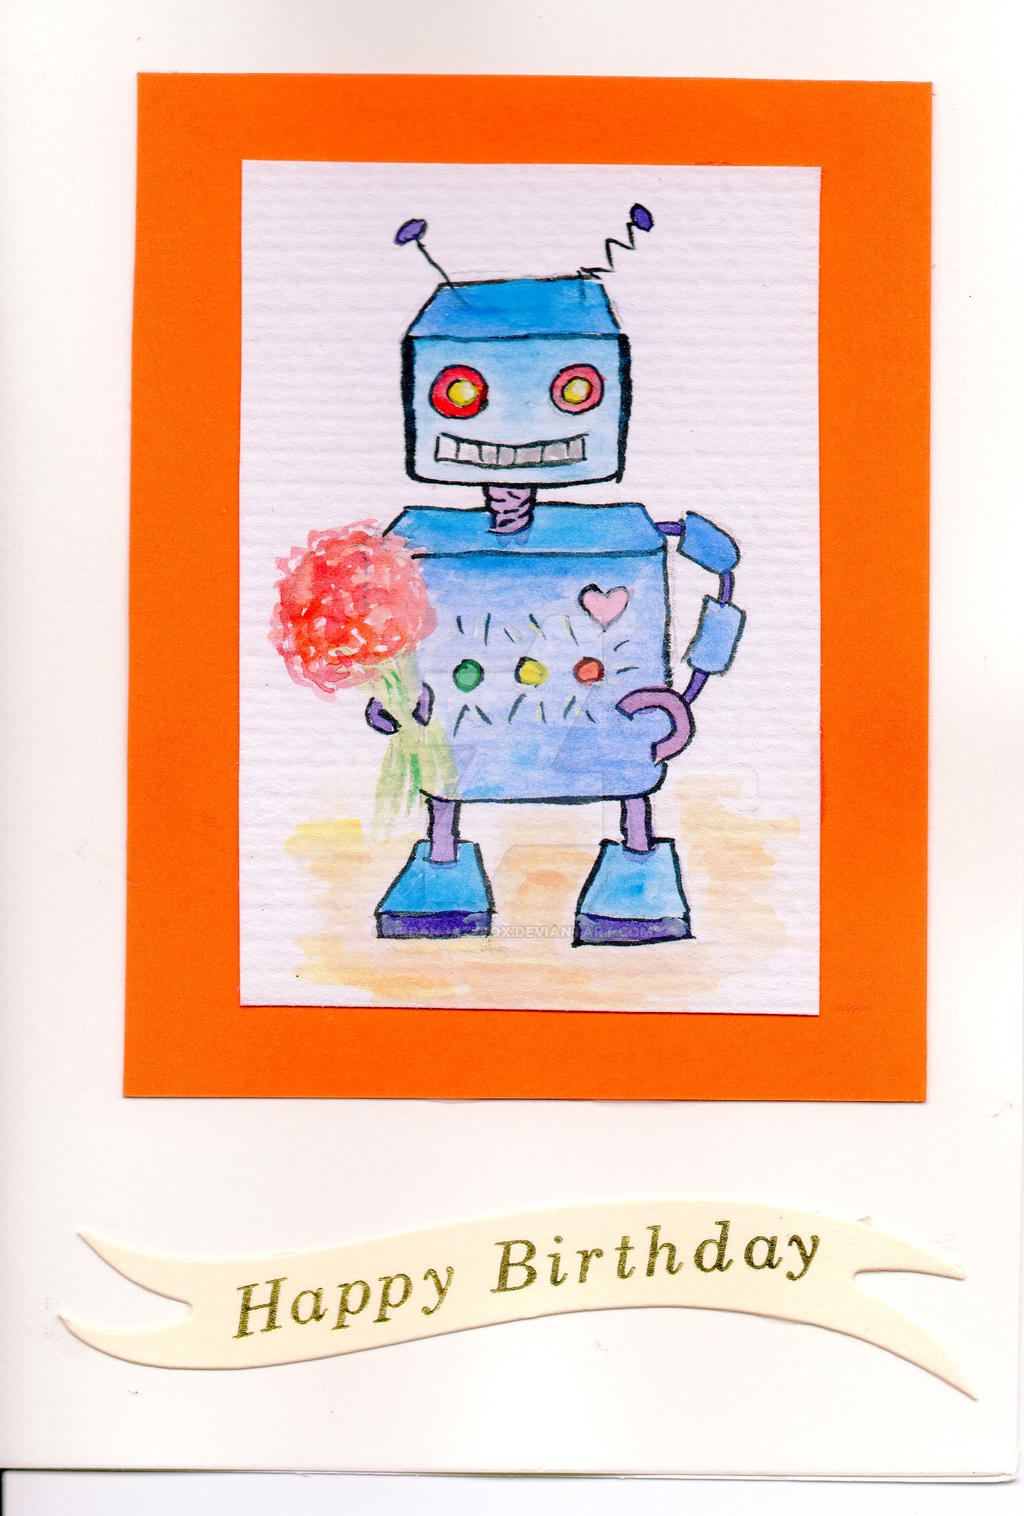 Birthday Robot #1 by UrbanJazzFox